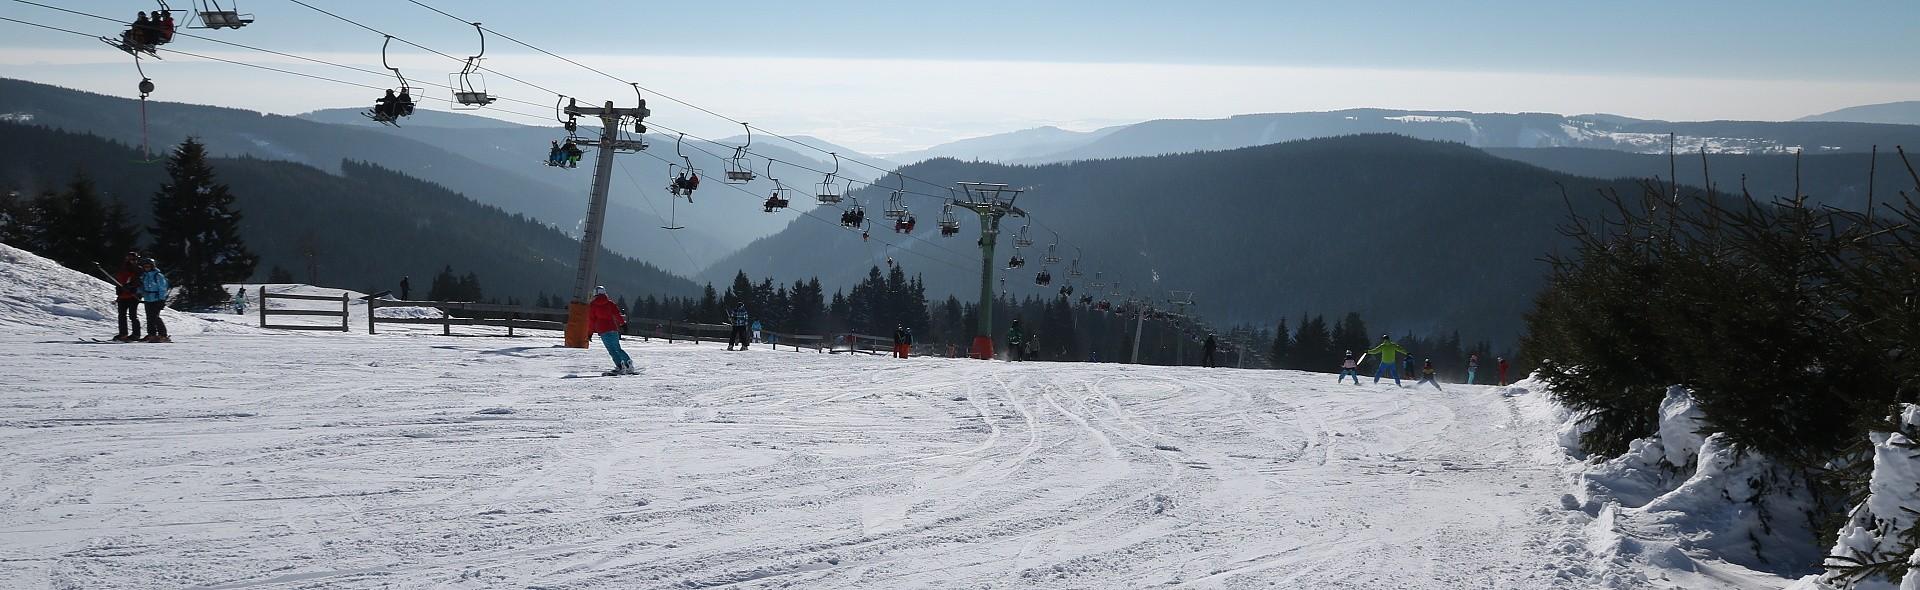 Alpinskifahren